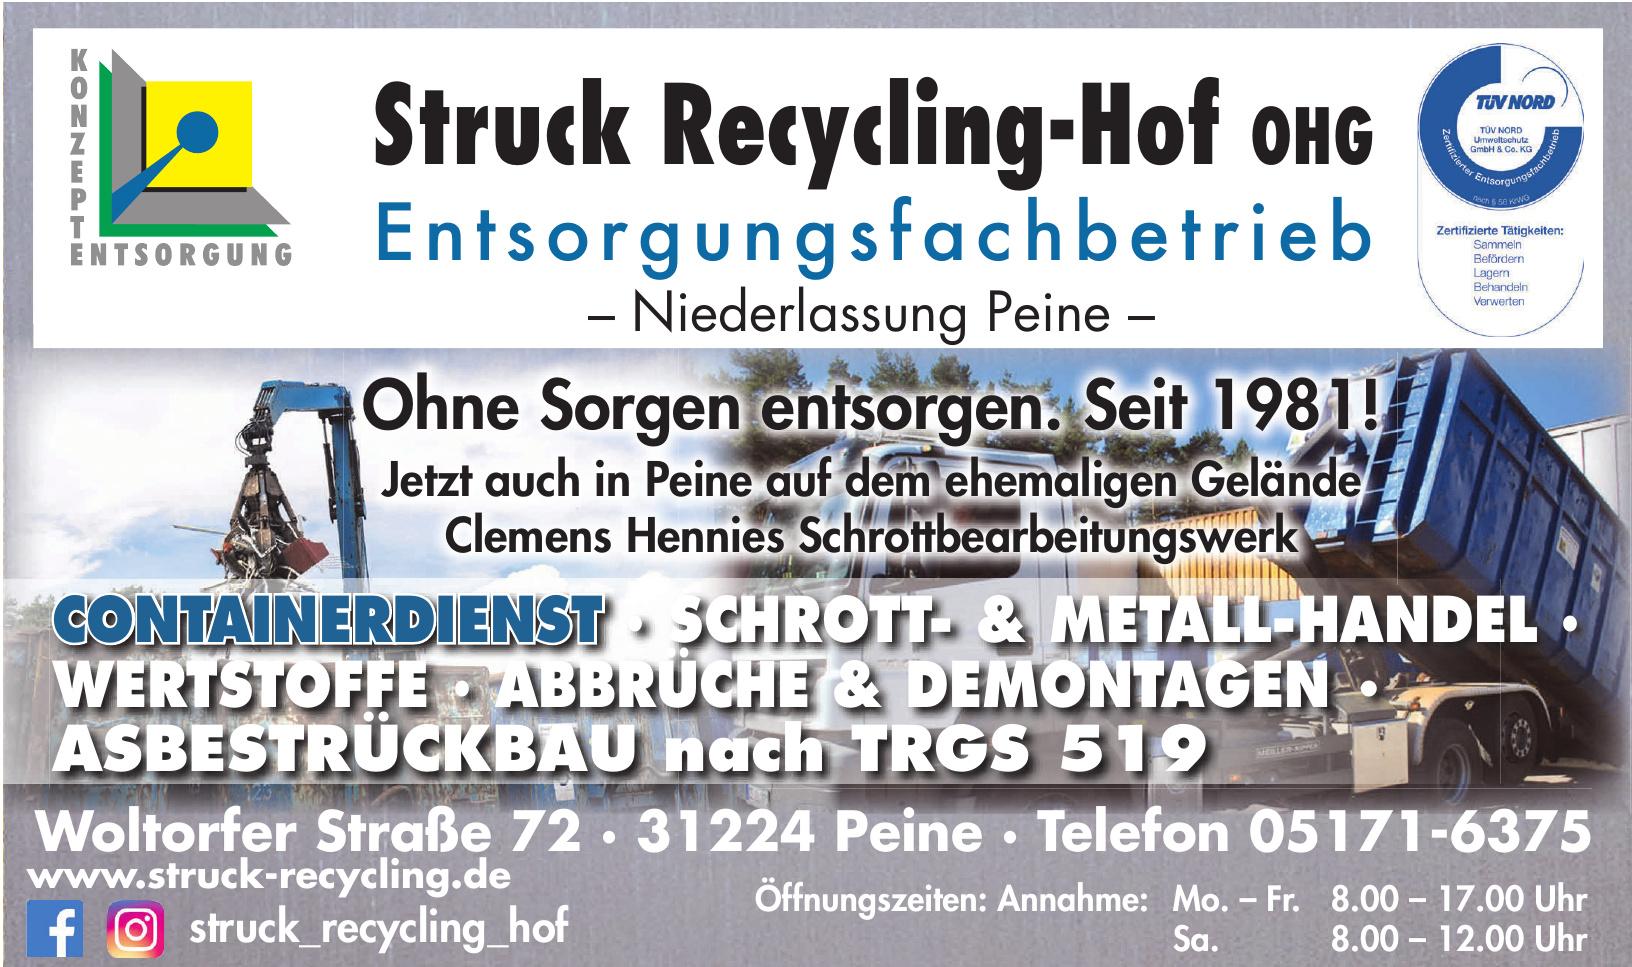 Struck Recycling-Hof OHG